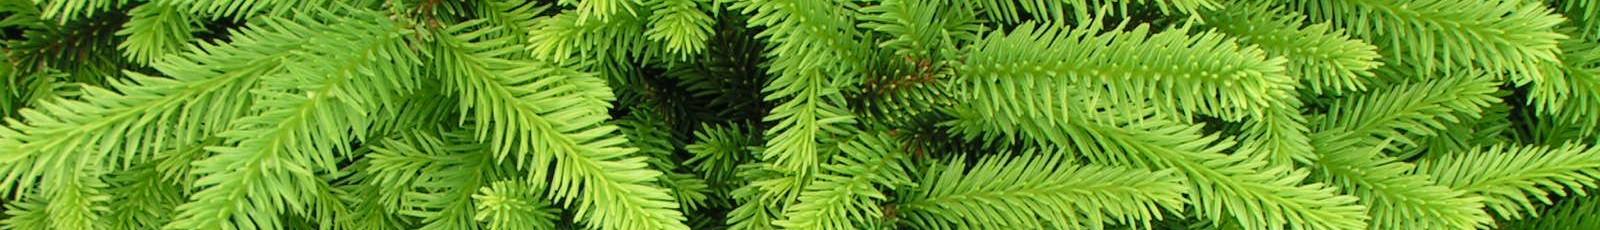 cropped-Picea-abies-Highlandia.jpg